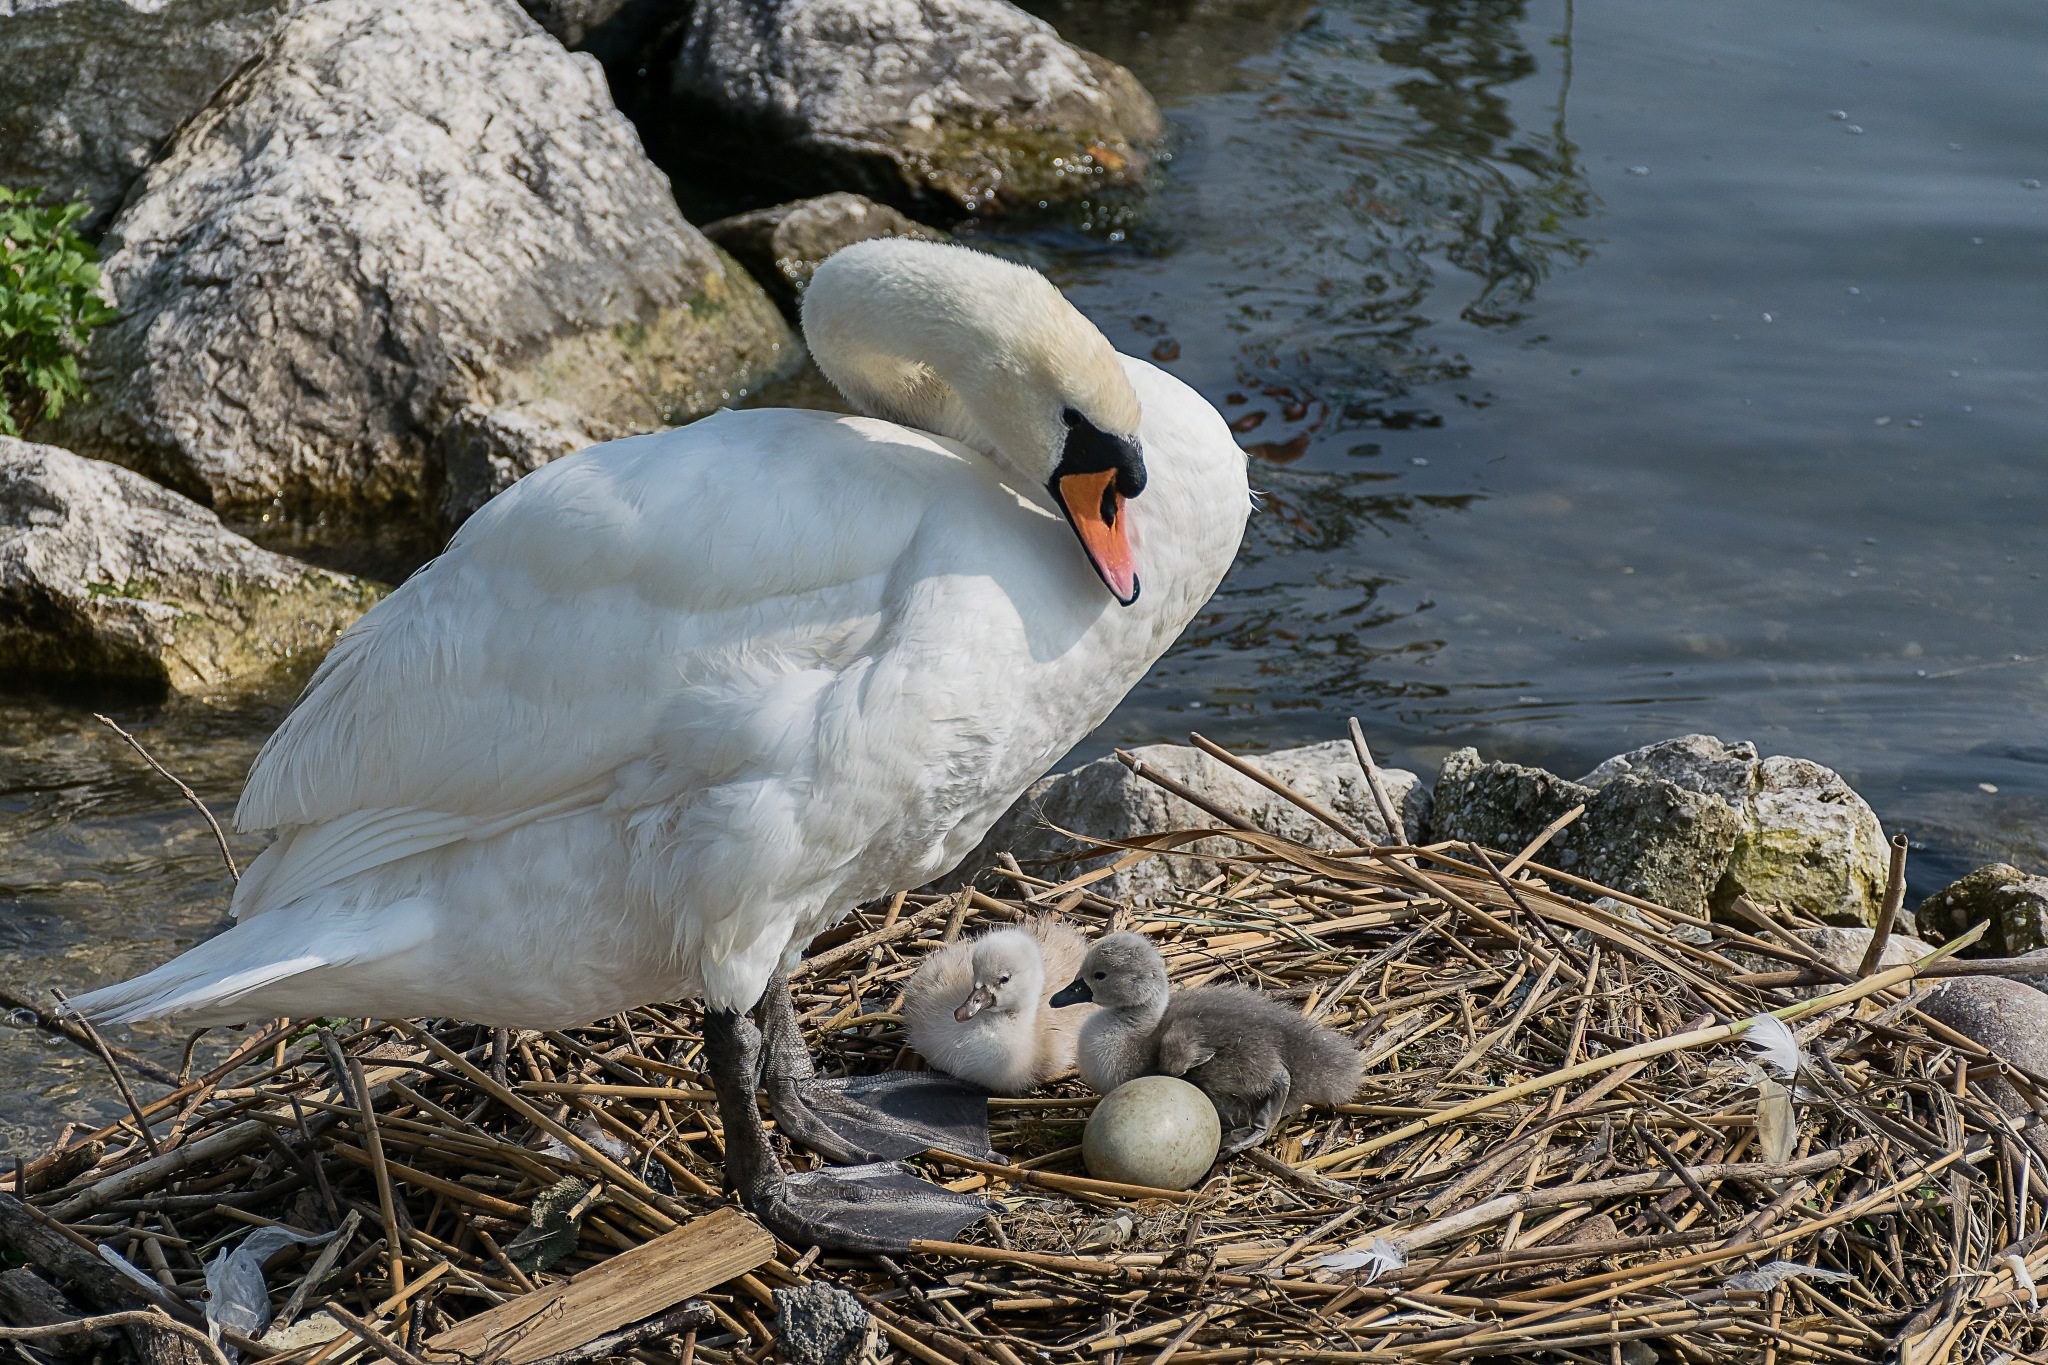 Swan family by Mauro De Vita